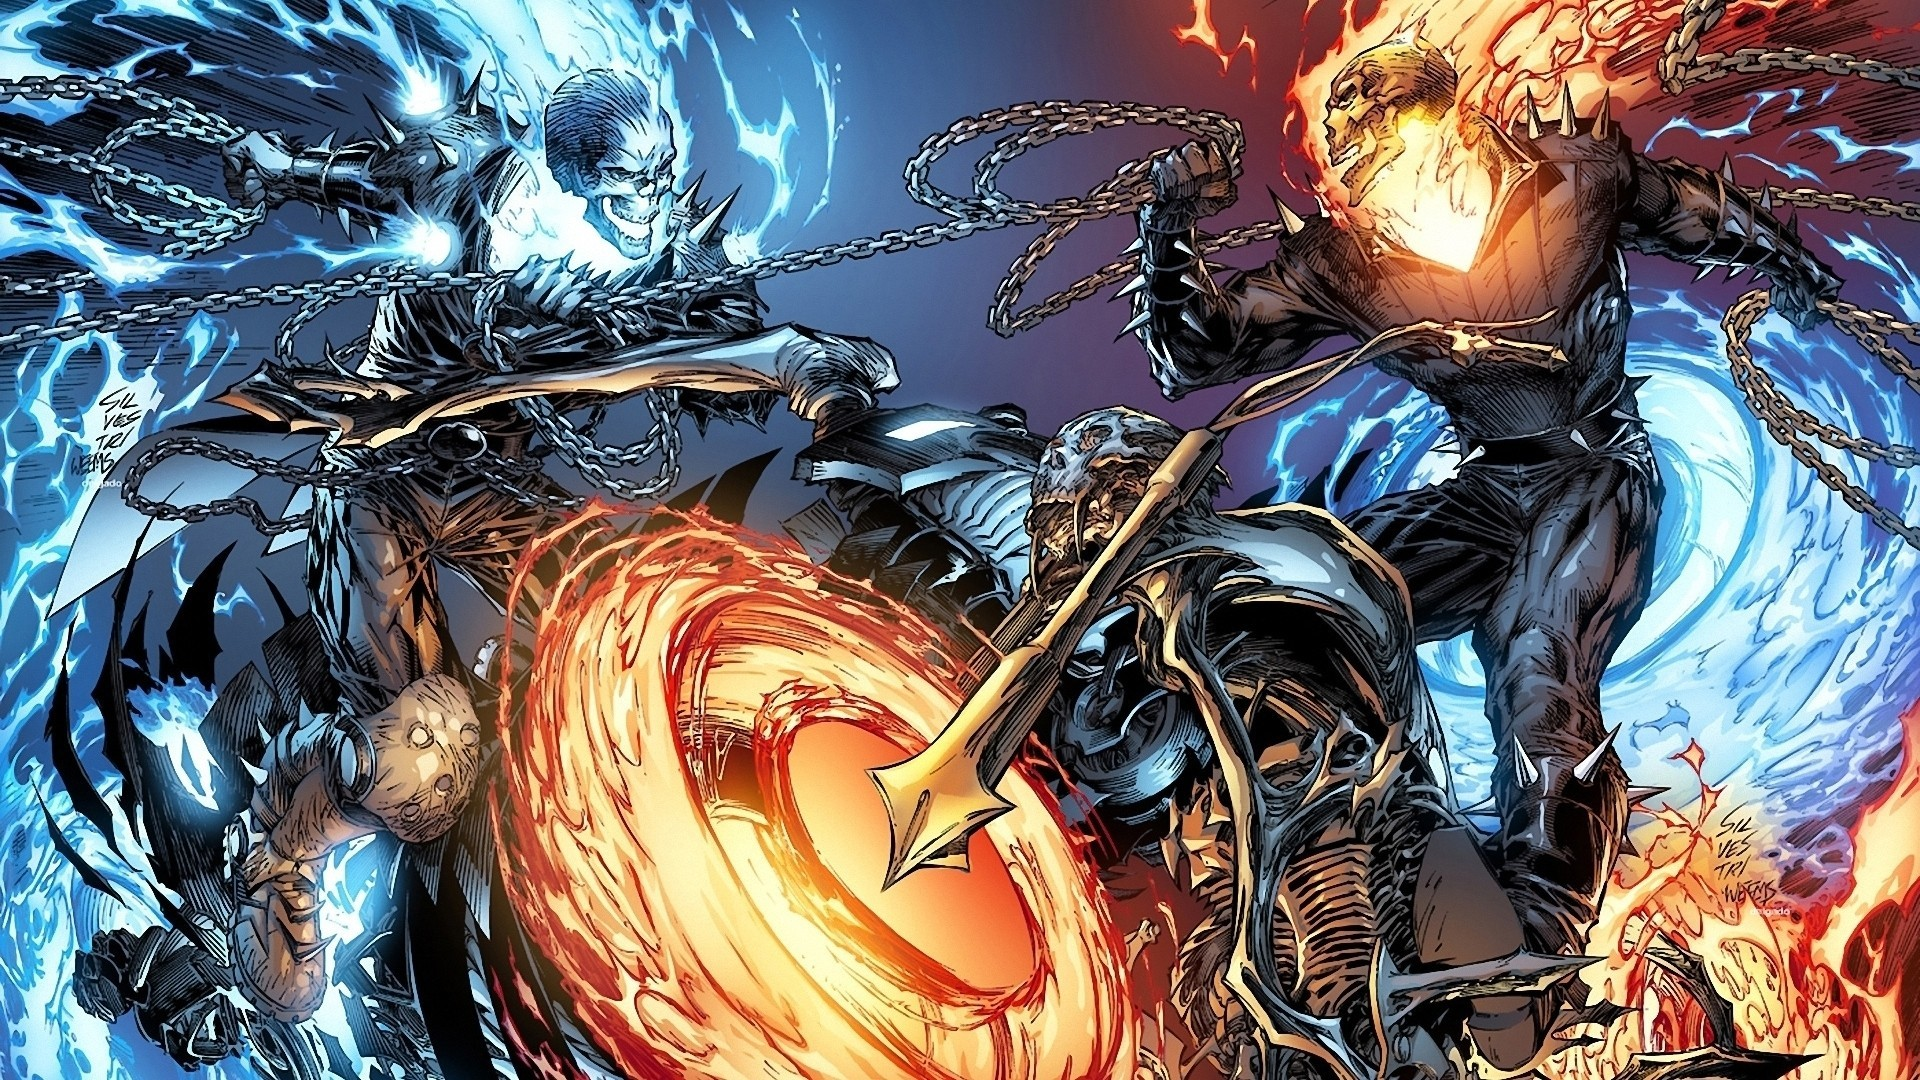 marvel com | Comics Ghost Rider Marvel Comics Fresh New HD Wallpaper Best  Quality .